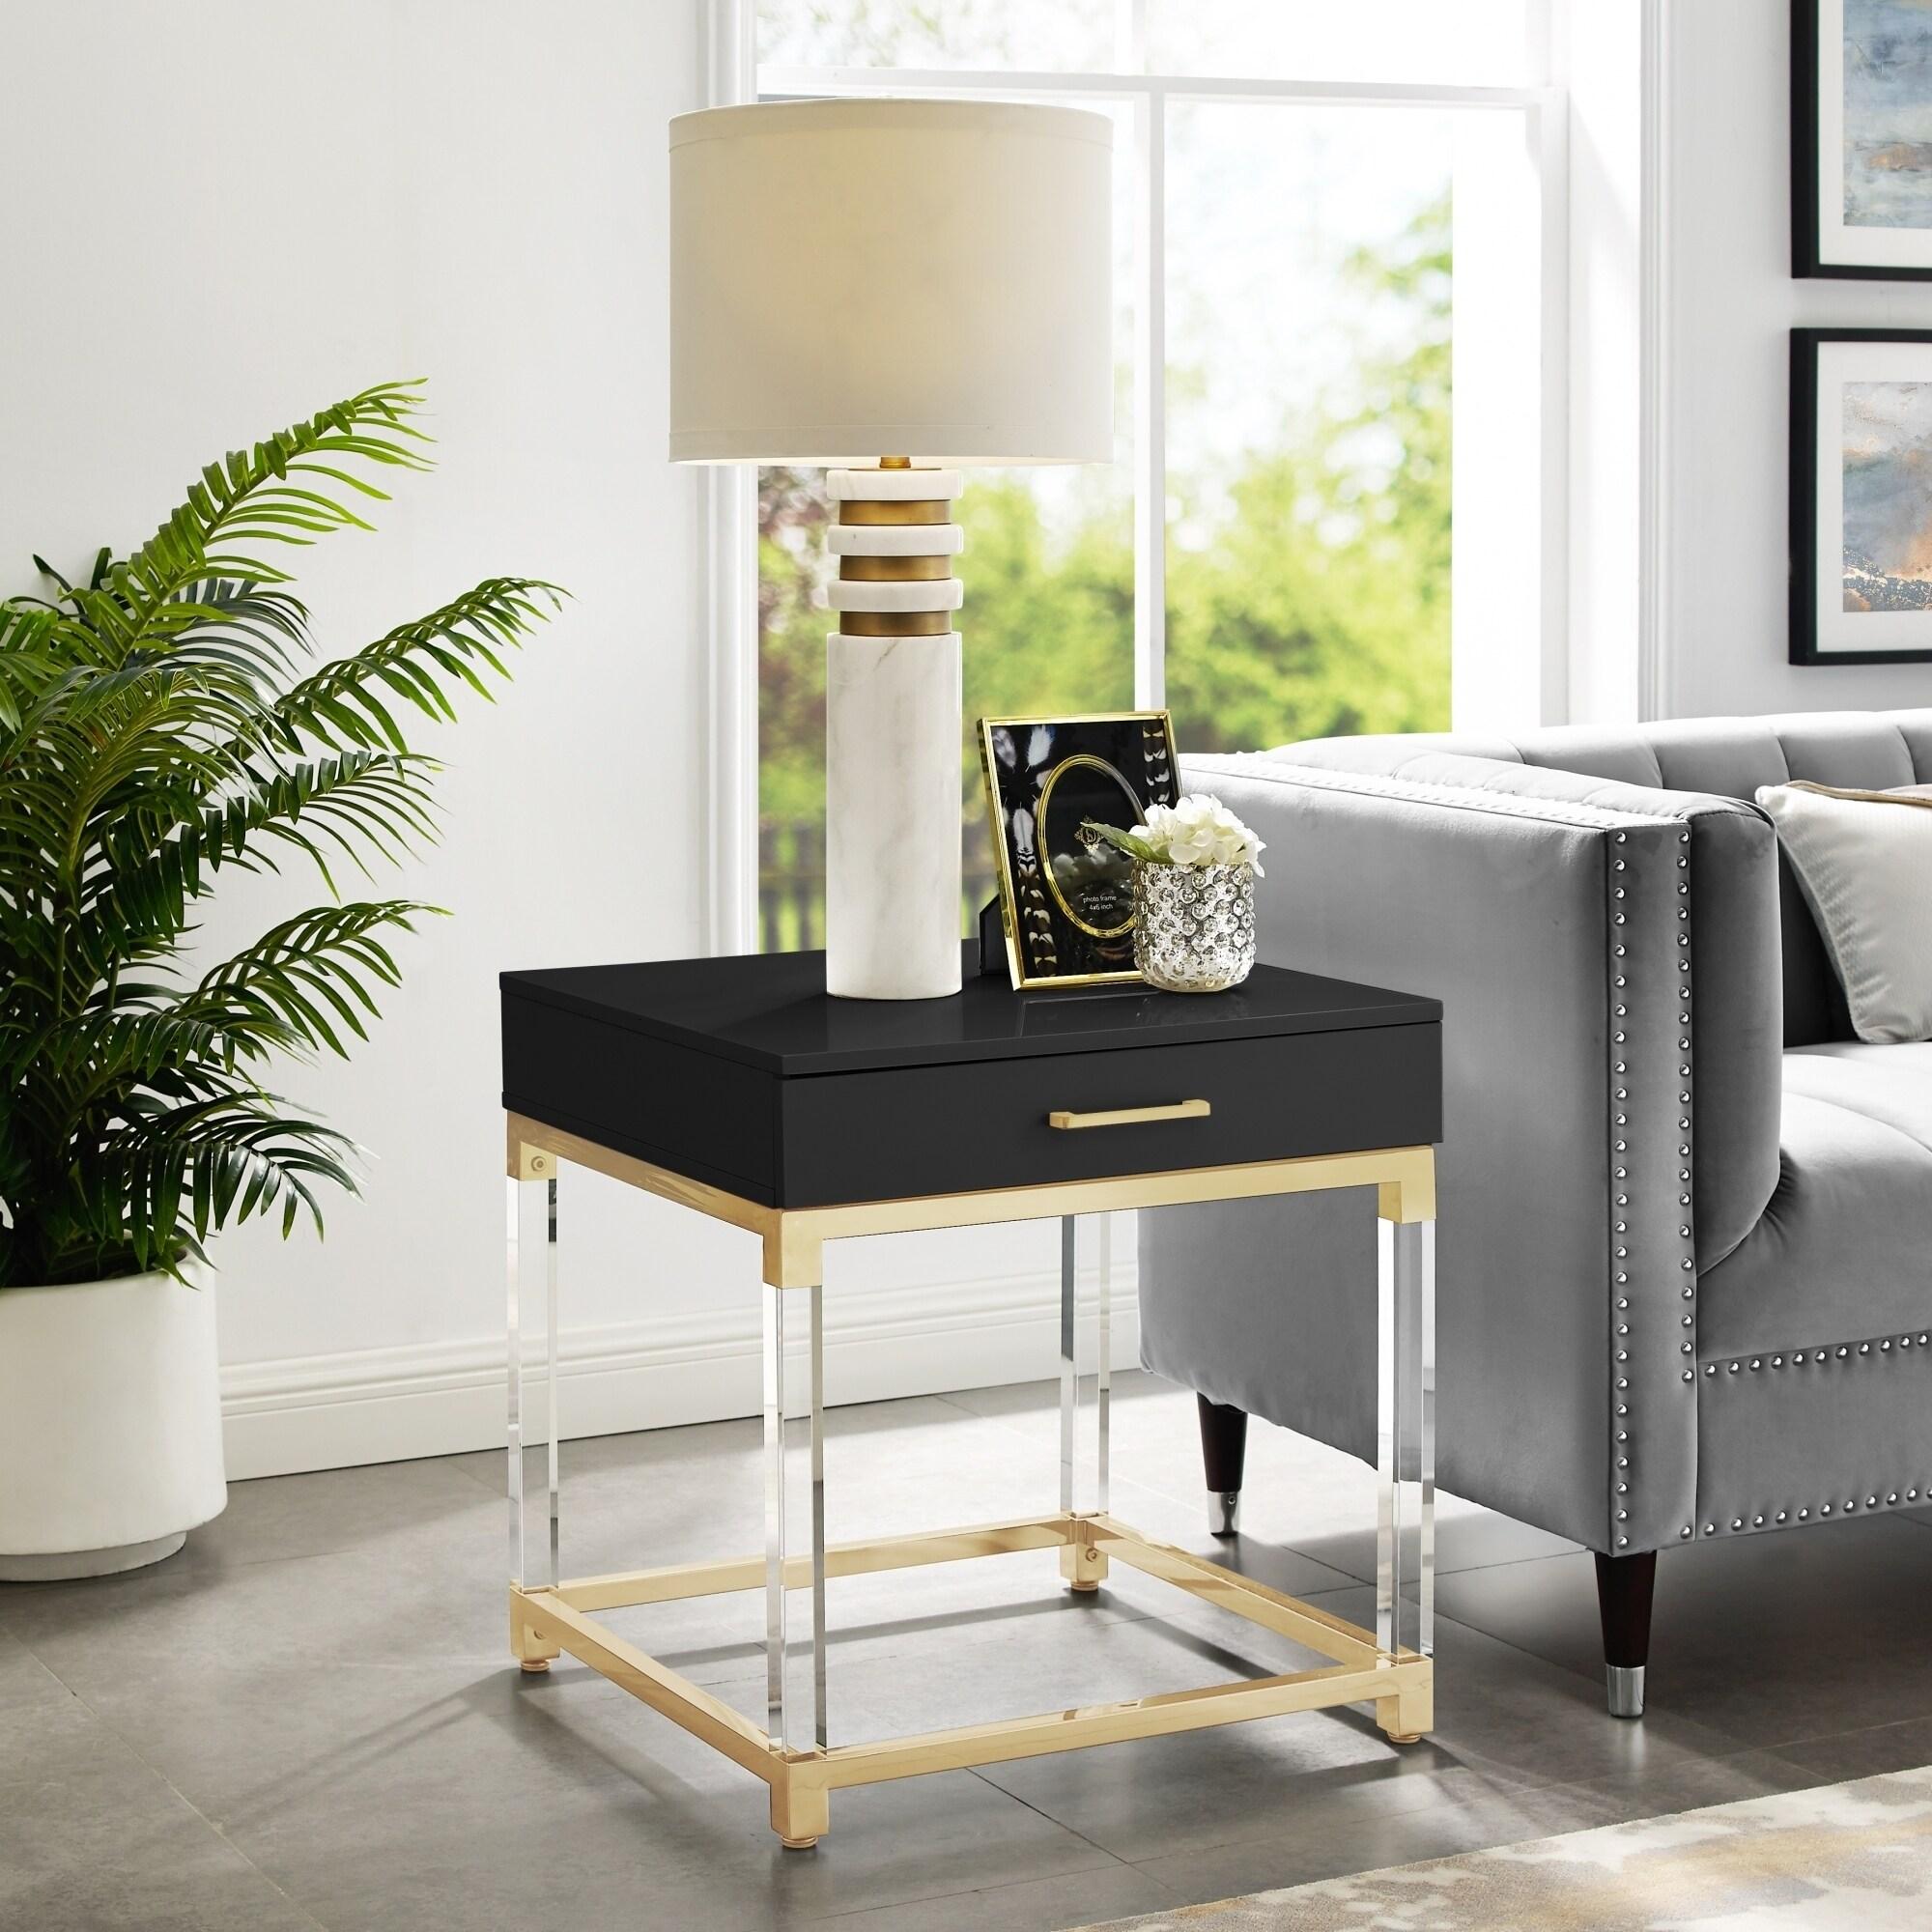 Alvaro High Gloss End Table With Acrylic Legs And Metal Base